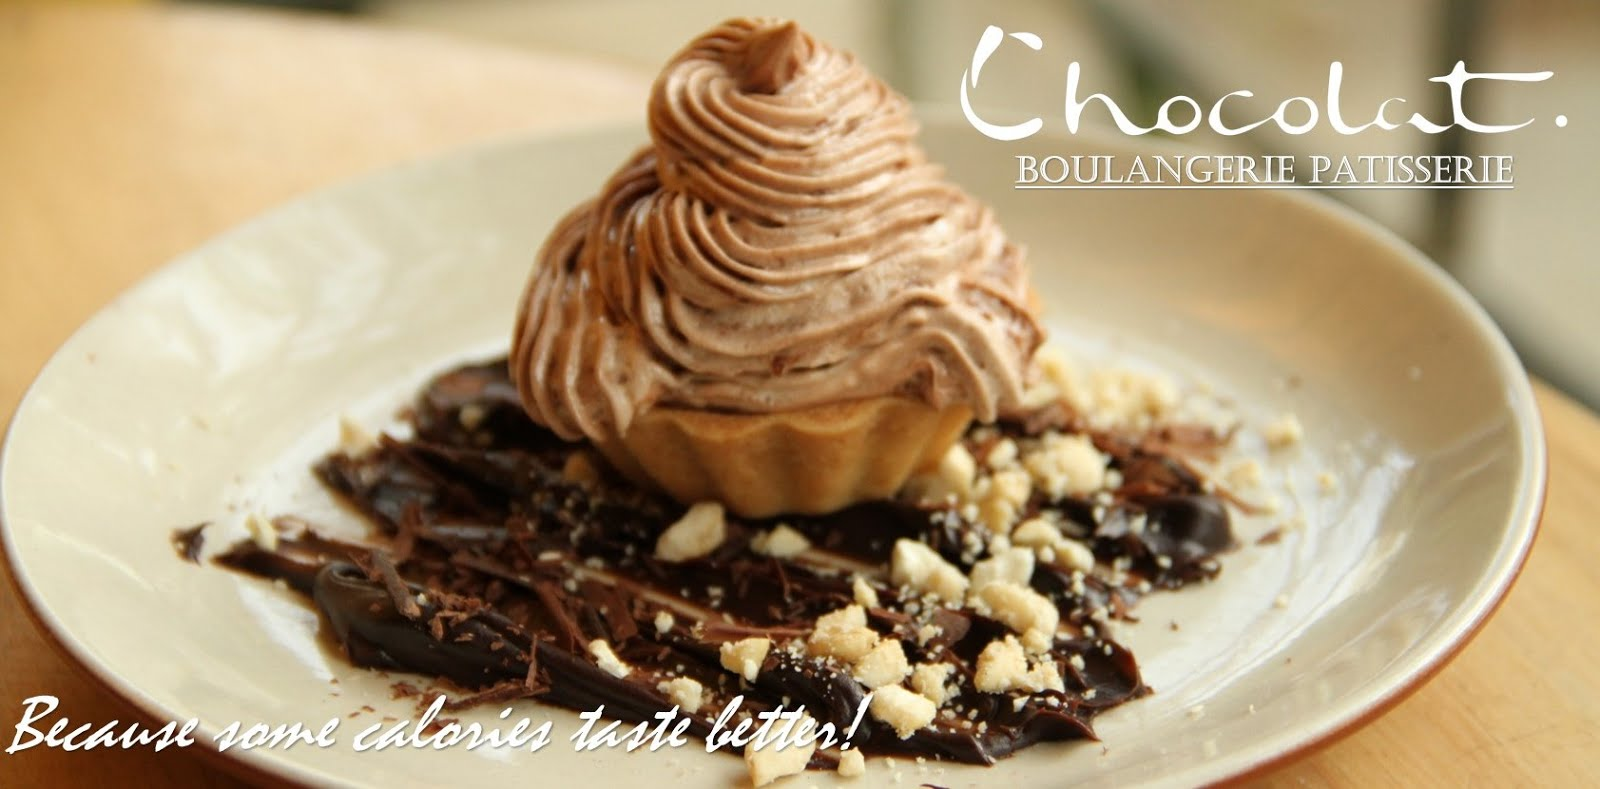 Chocolat Boulangerie Patisserie